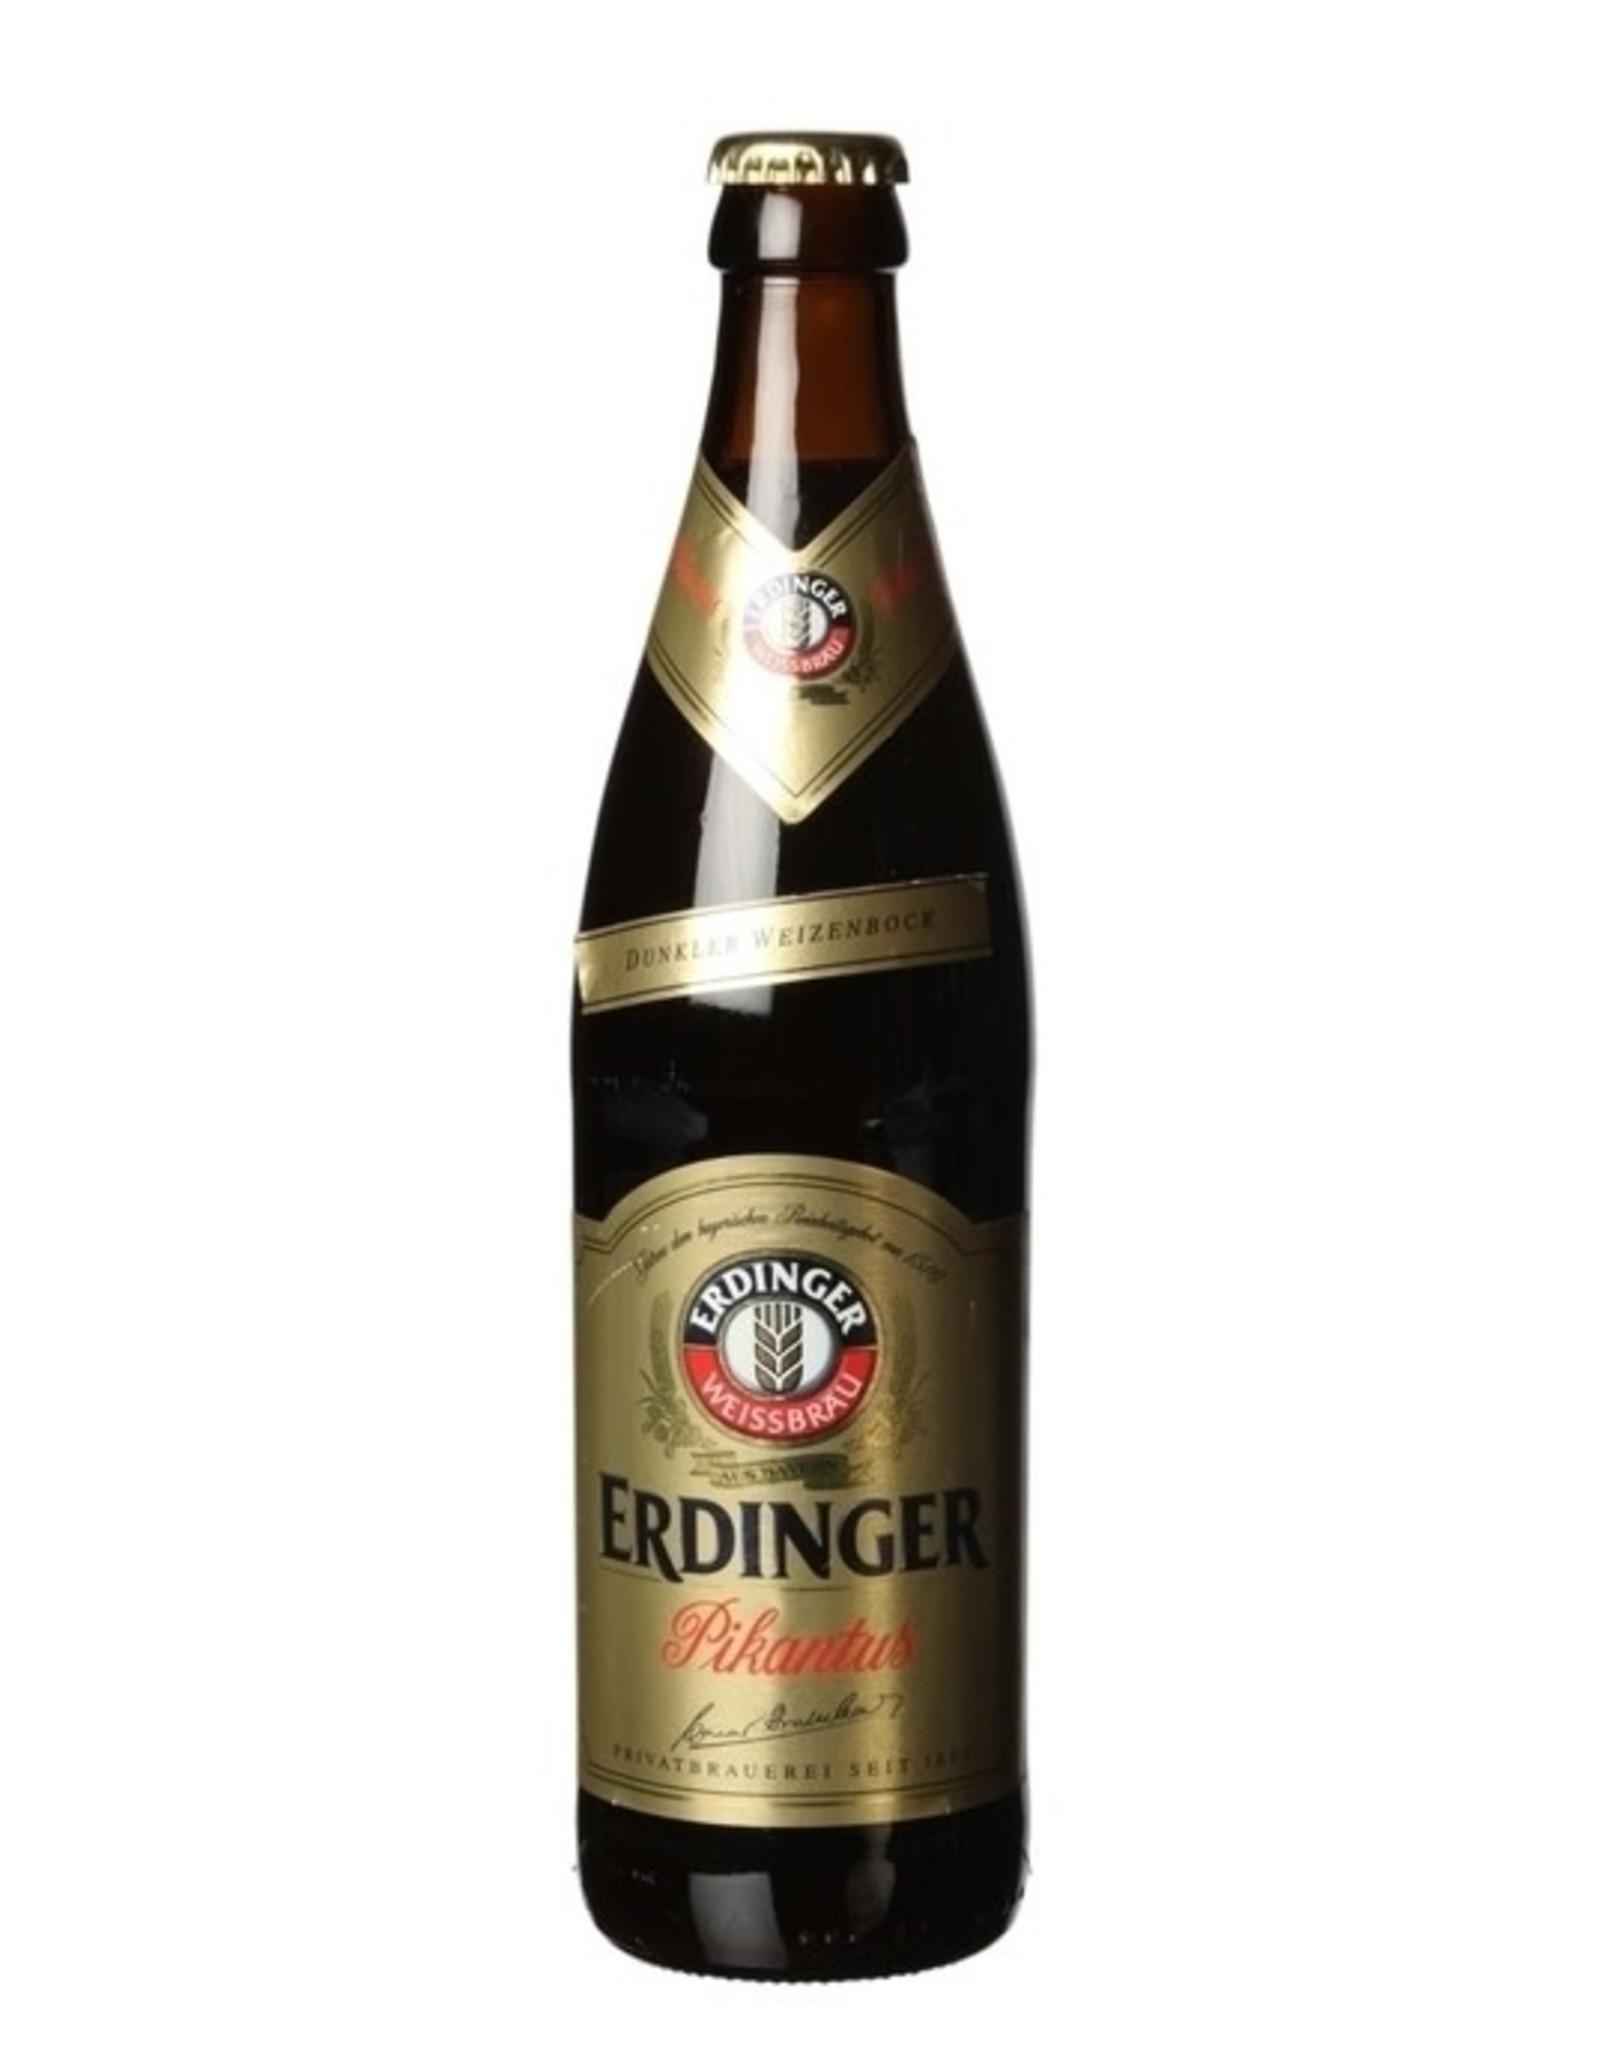 Erdinger Erdinger Pikantas Weizen-Bock